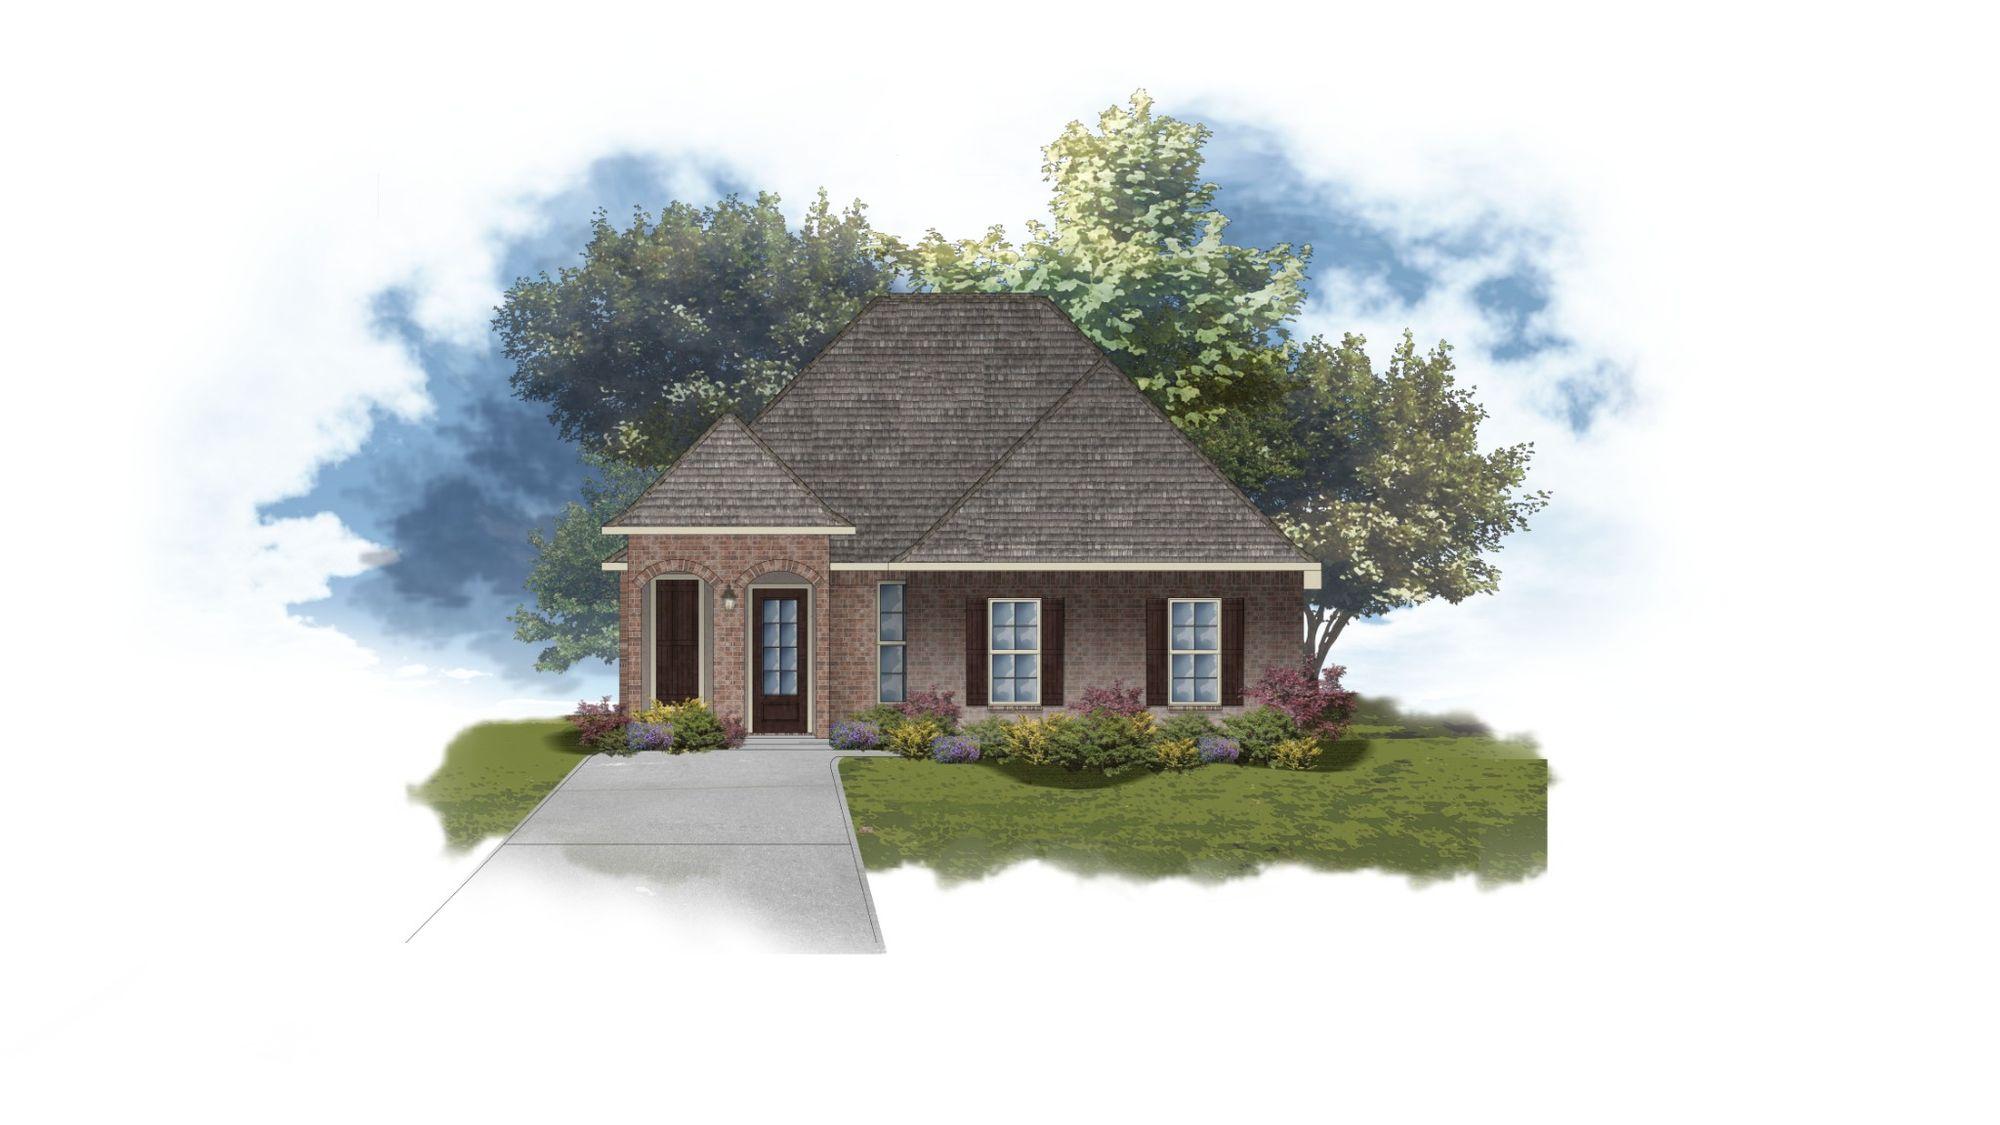 DSLD Homes - Ricci II B Open Floorplan Elevation Image